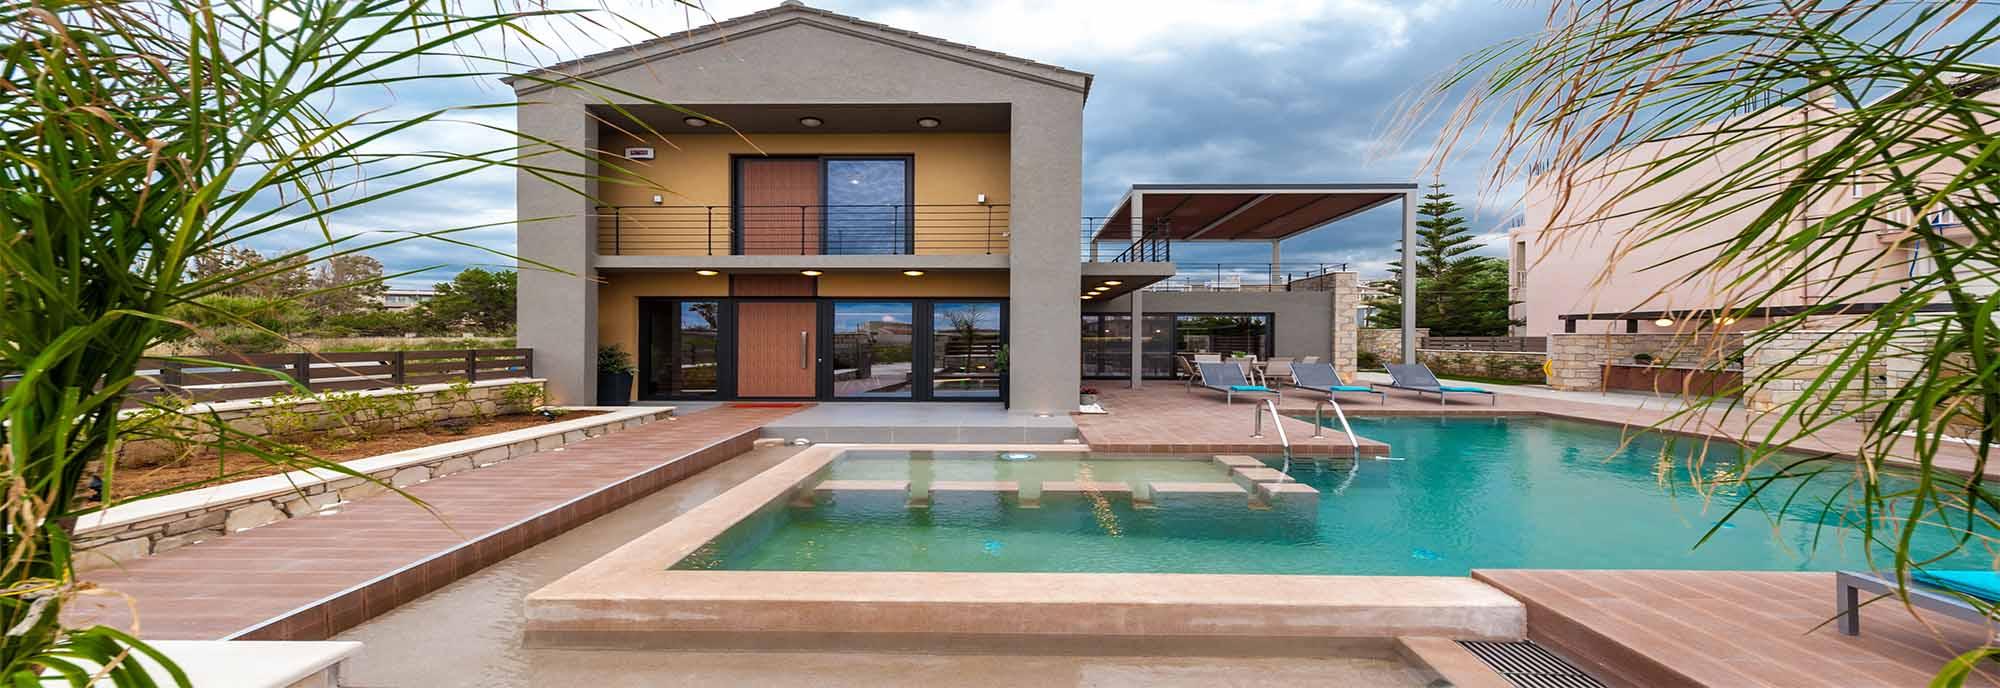 Zografia Luxury Villa (Heated Pool)